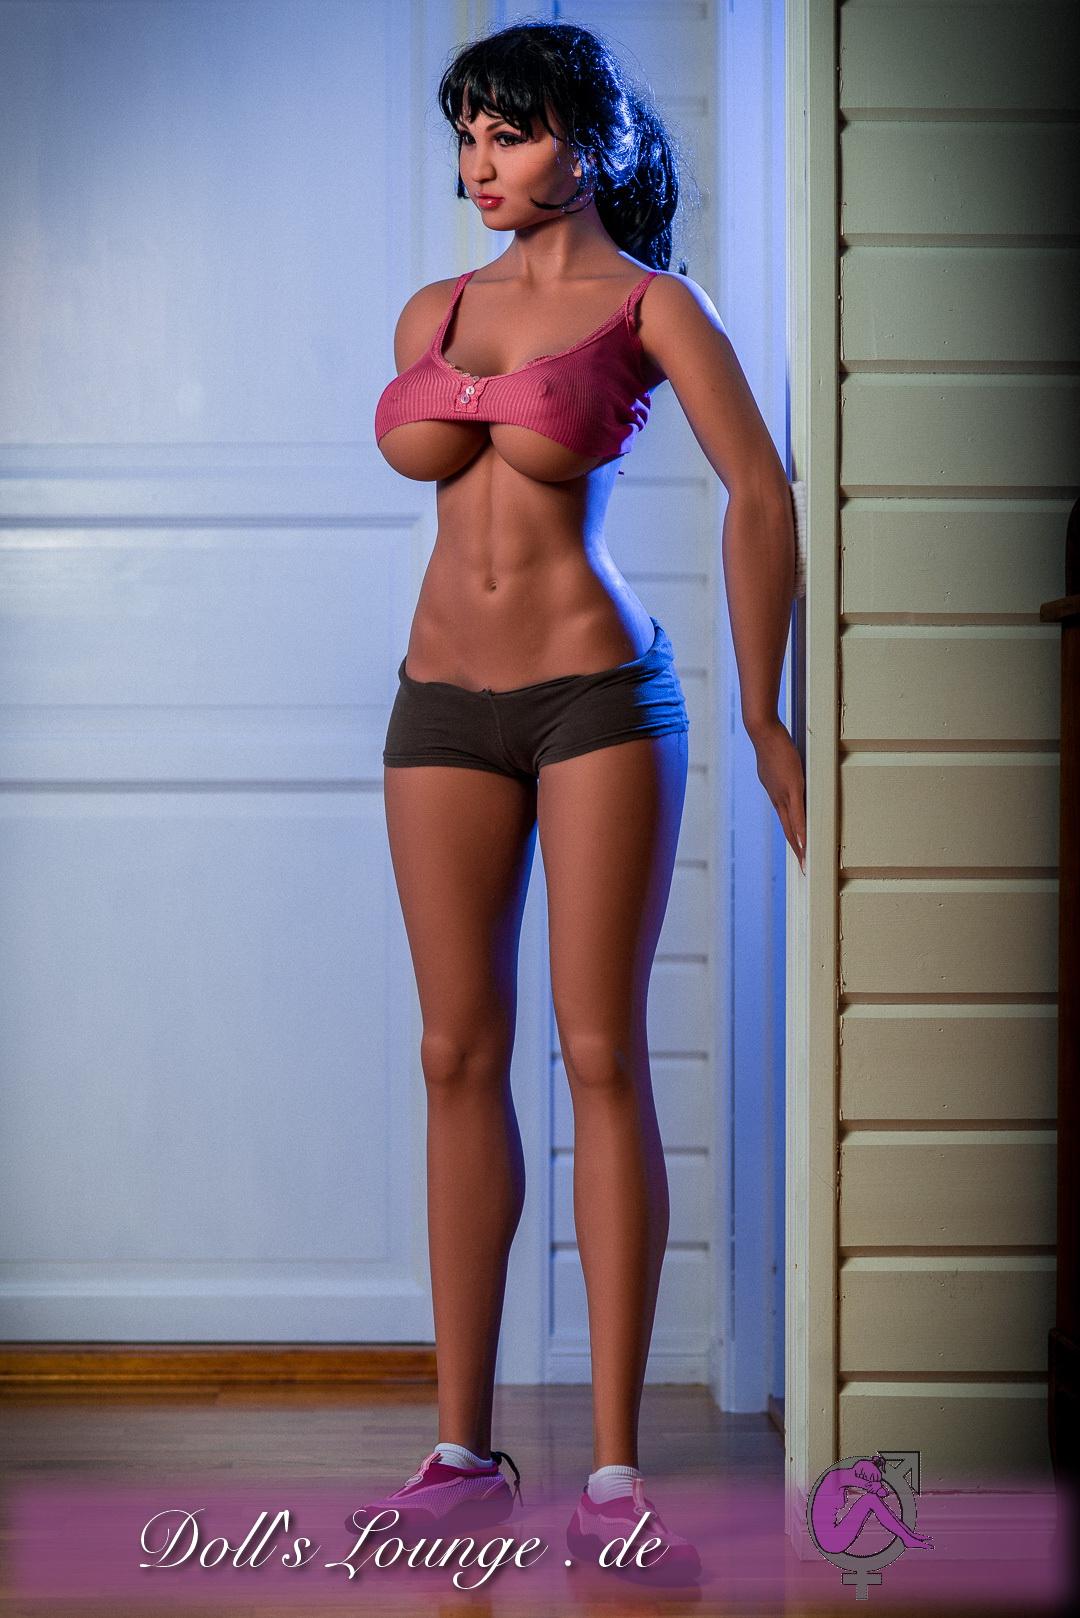 Premium WM-Doll 1meter70 Lovedoll TPE Lovedoll 170cm Gummipuppe Wisanita